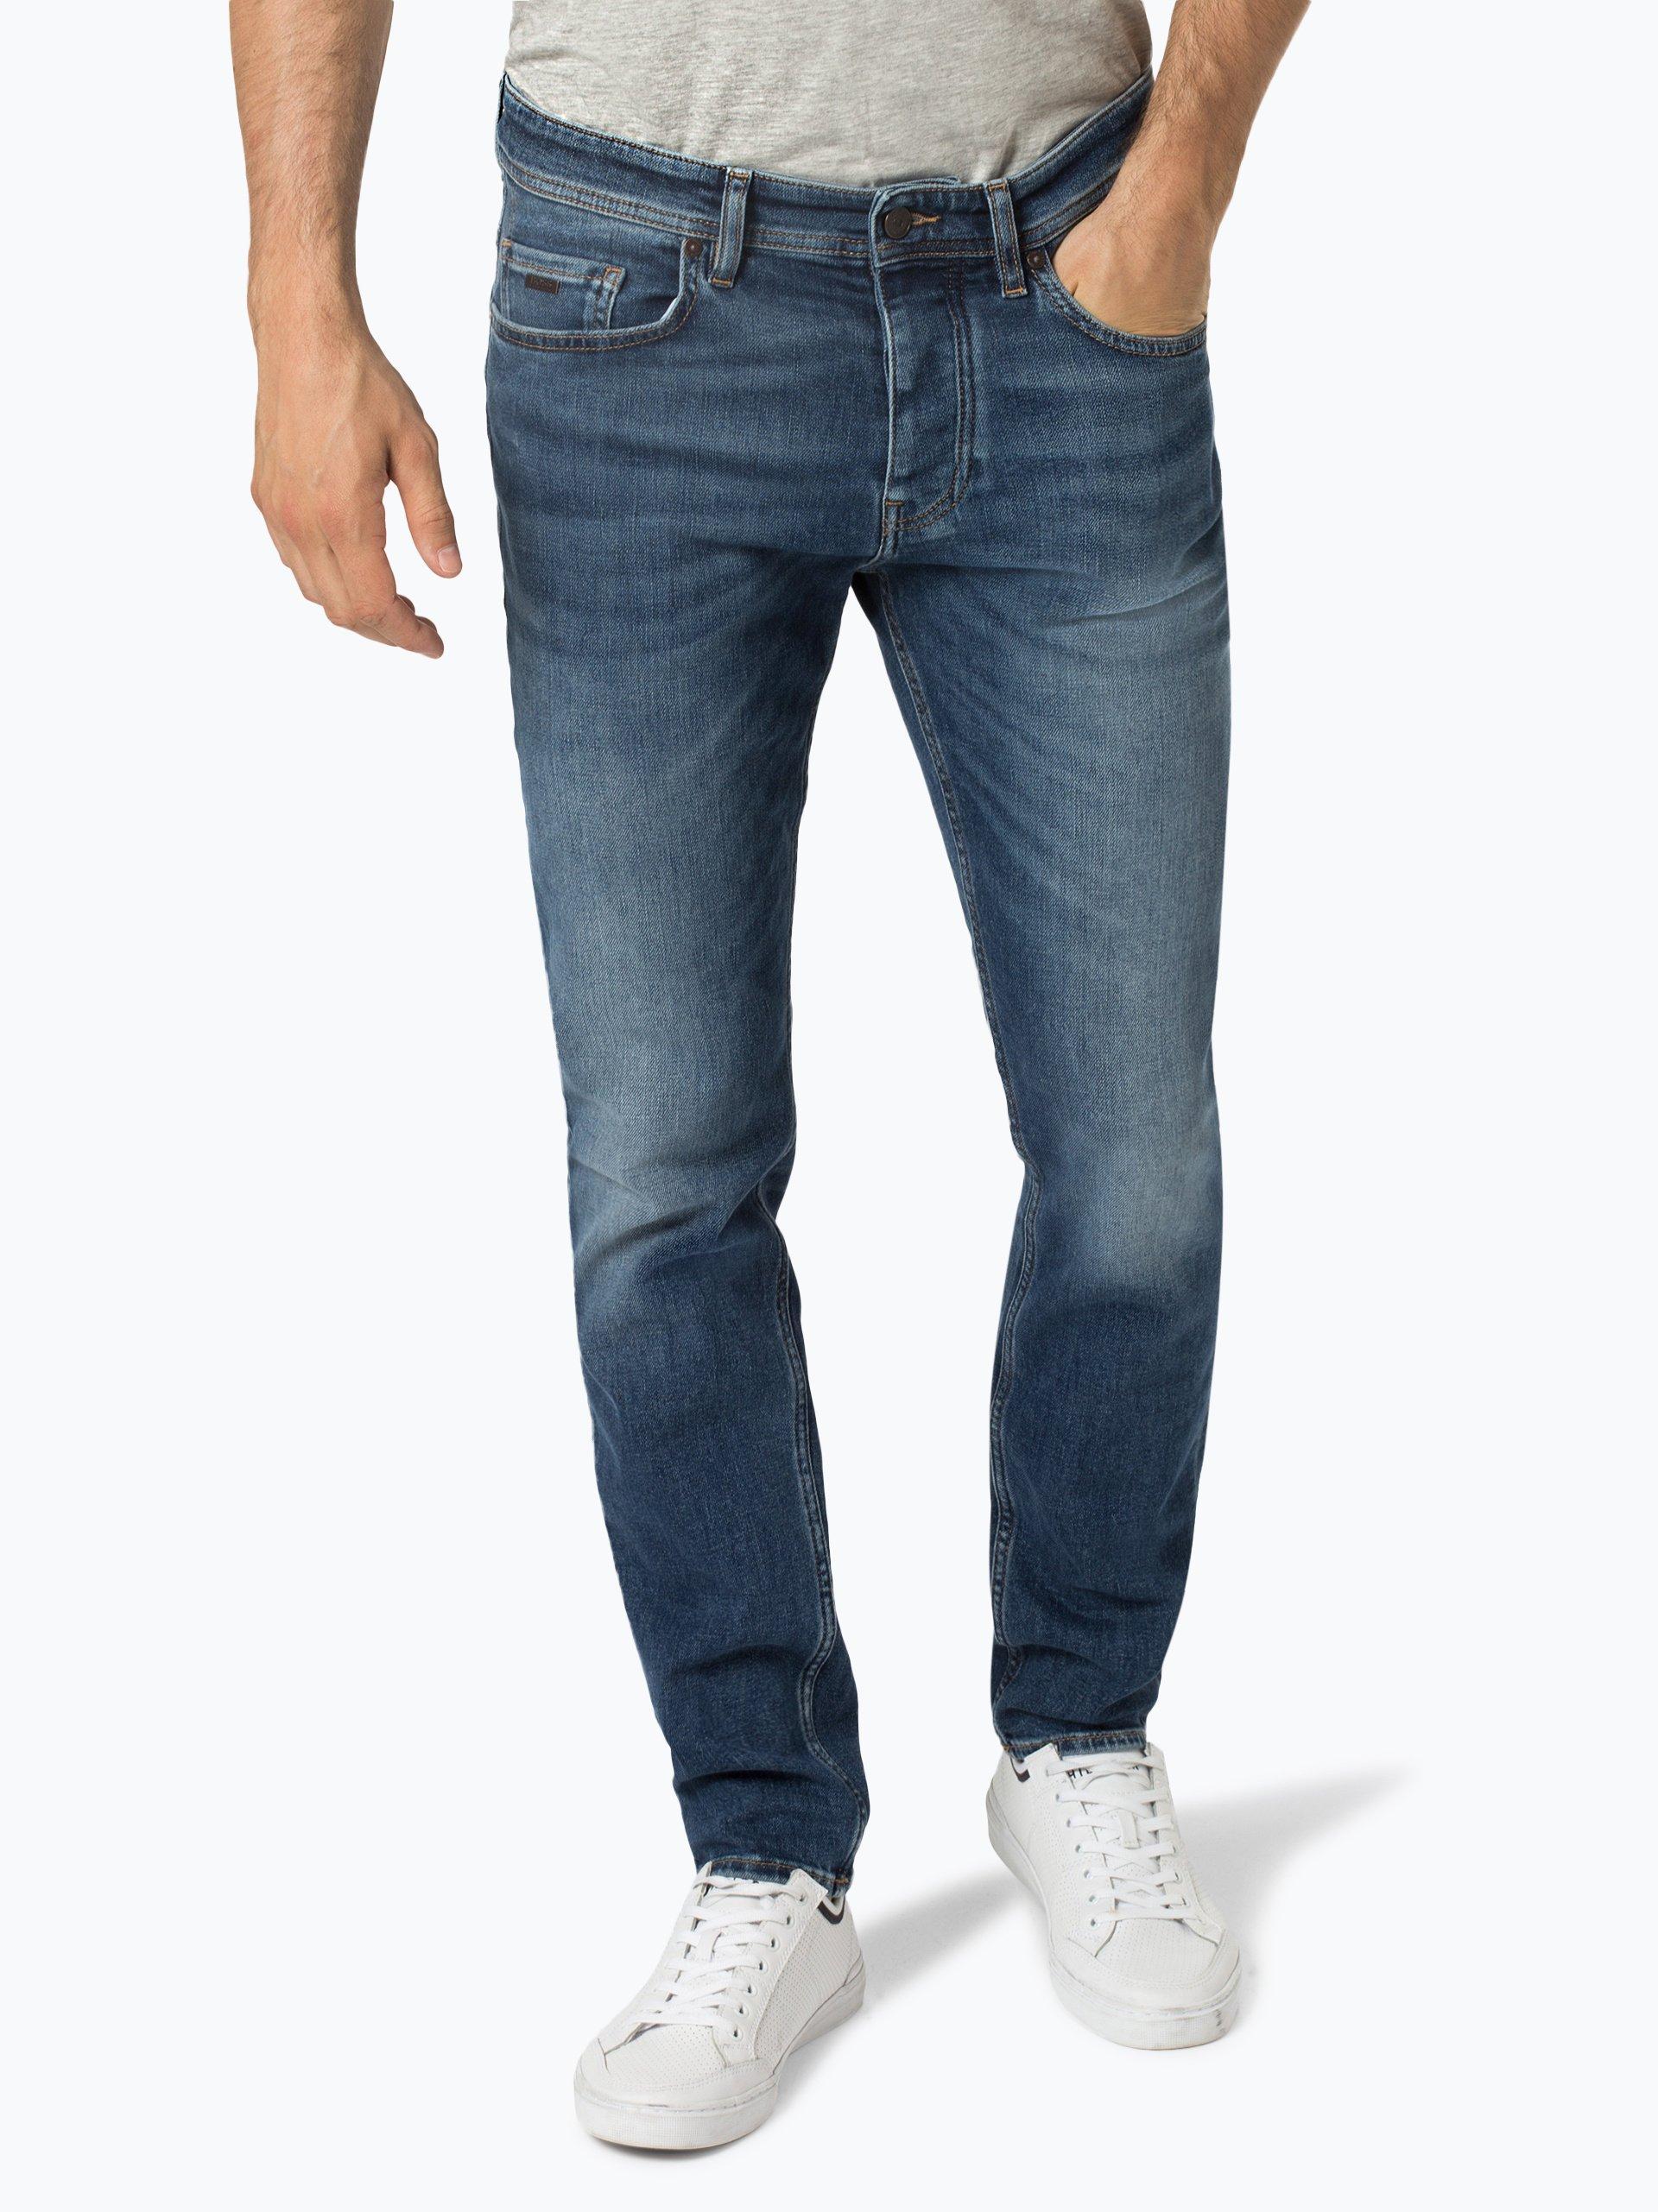 boss casual herren jeans taber bc c medium stone uni online kaufen peek und cloppenburg de. Black Bedroom Furniture Sets. Home Design Ideas